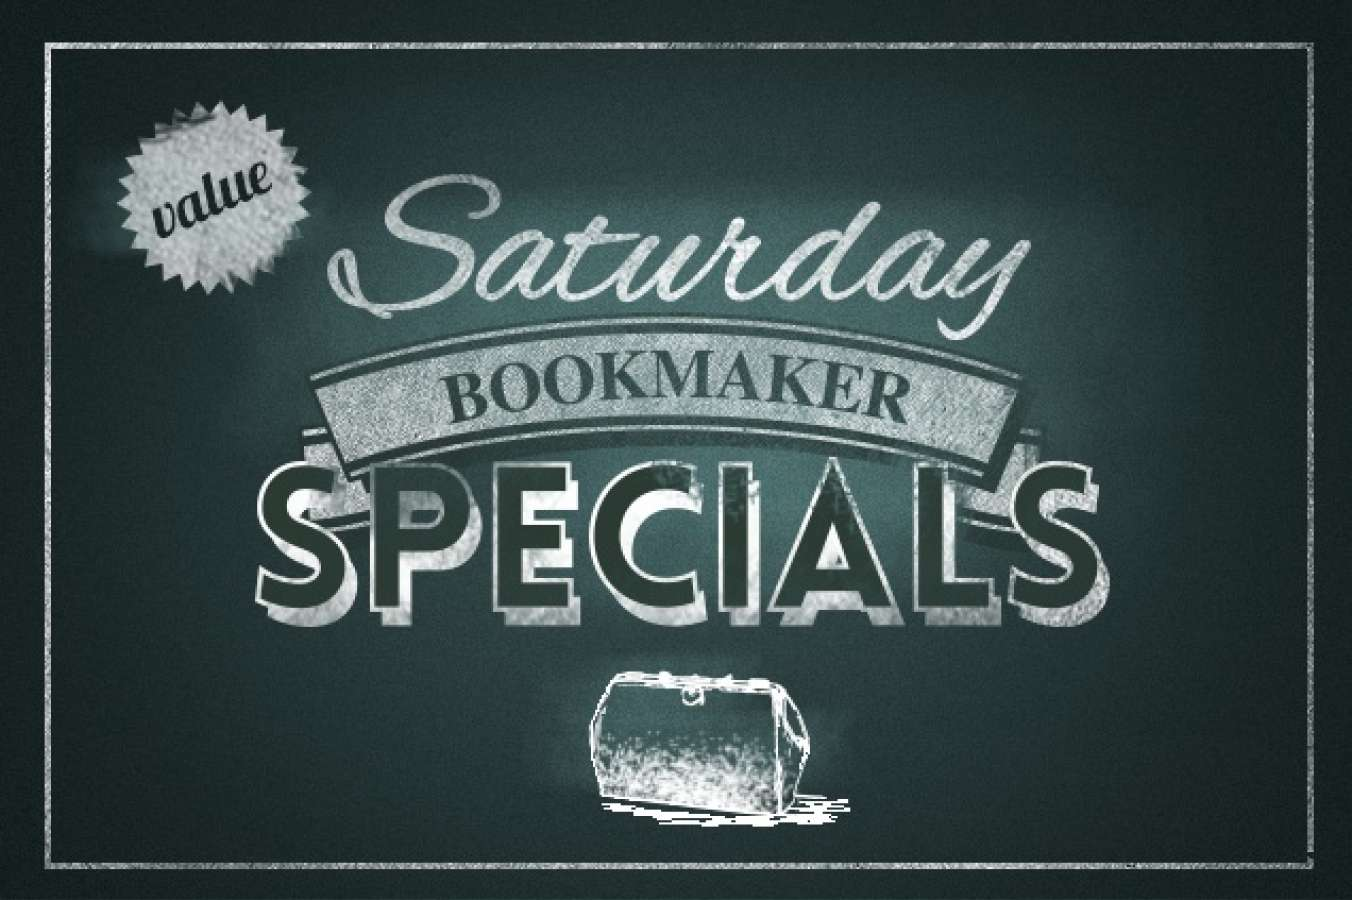 Weekend bookie specials